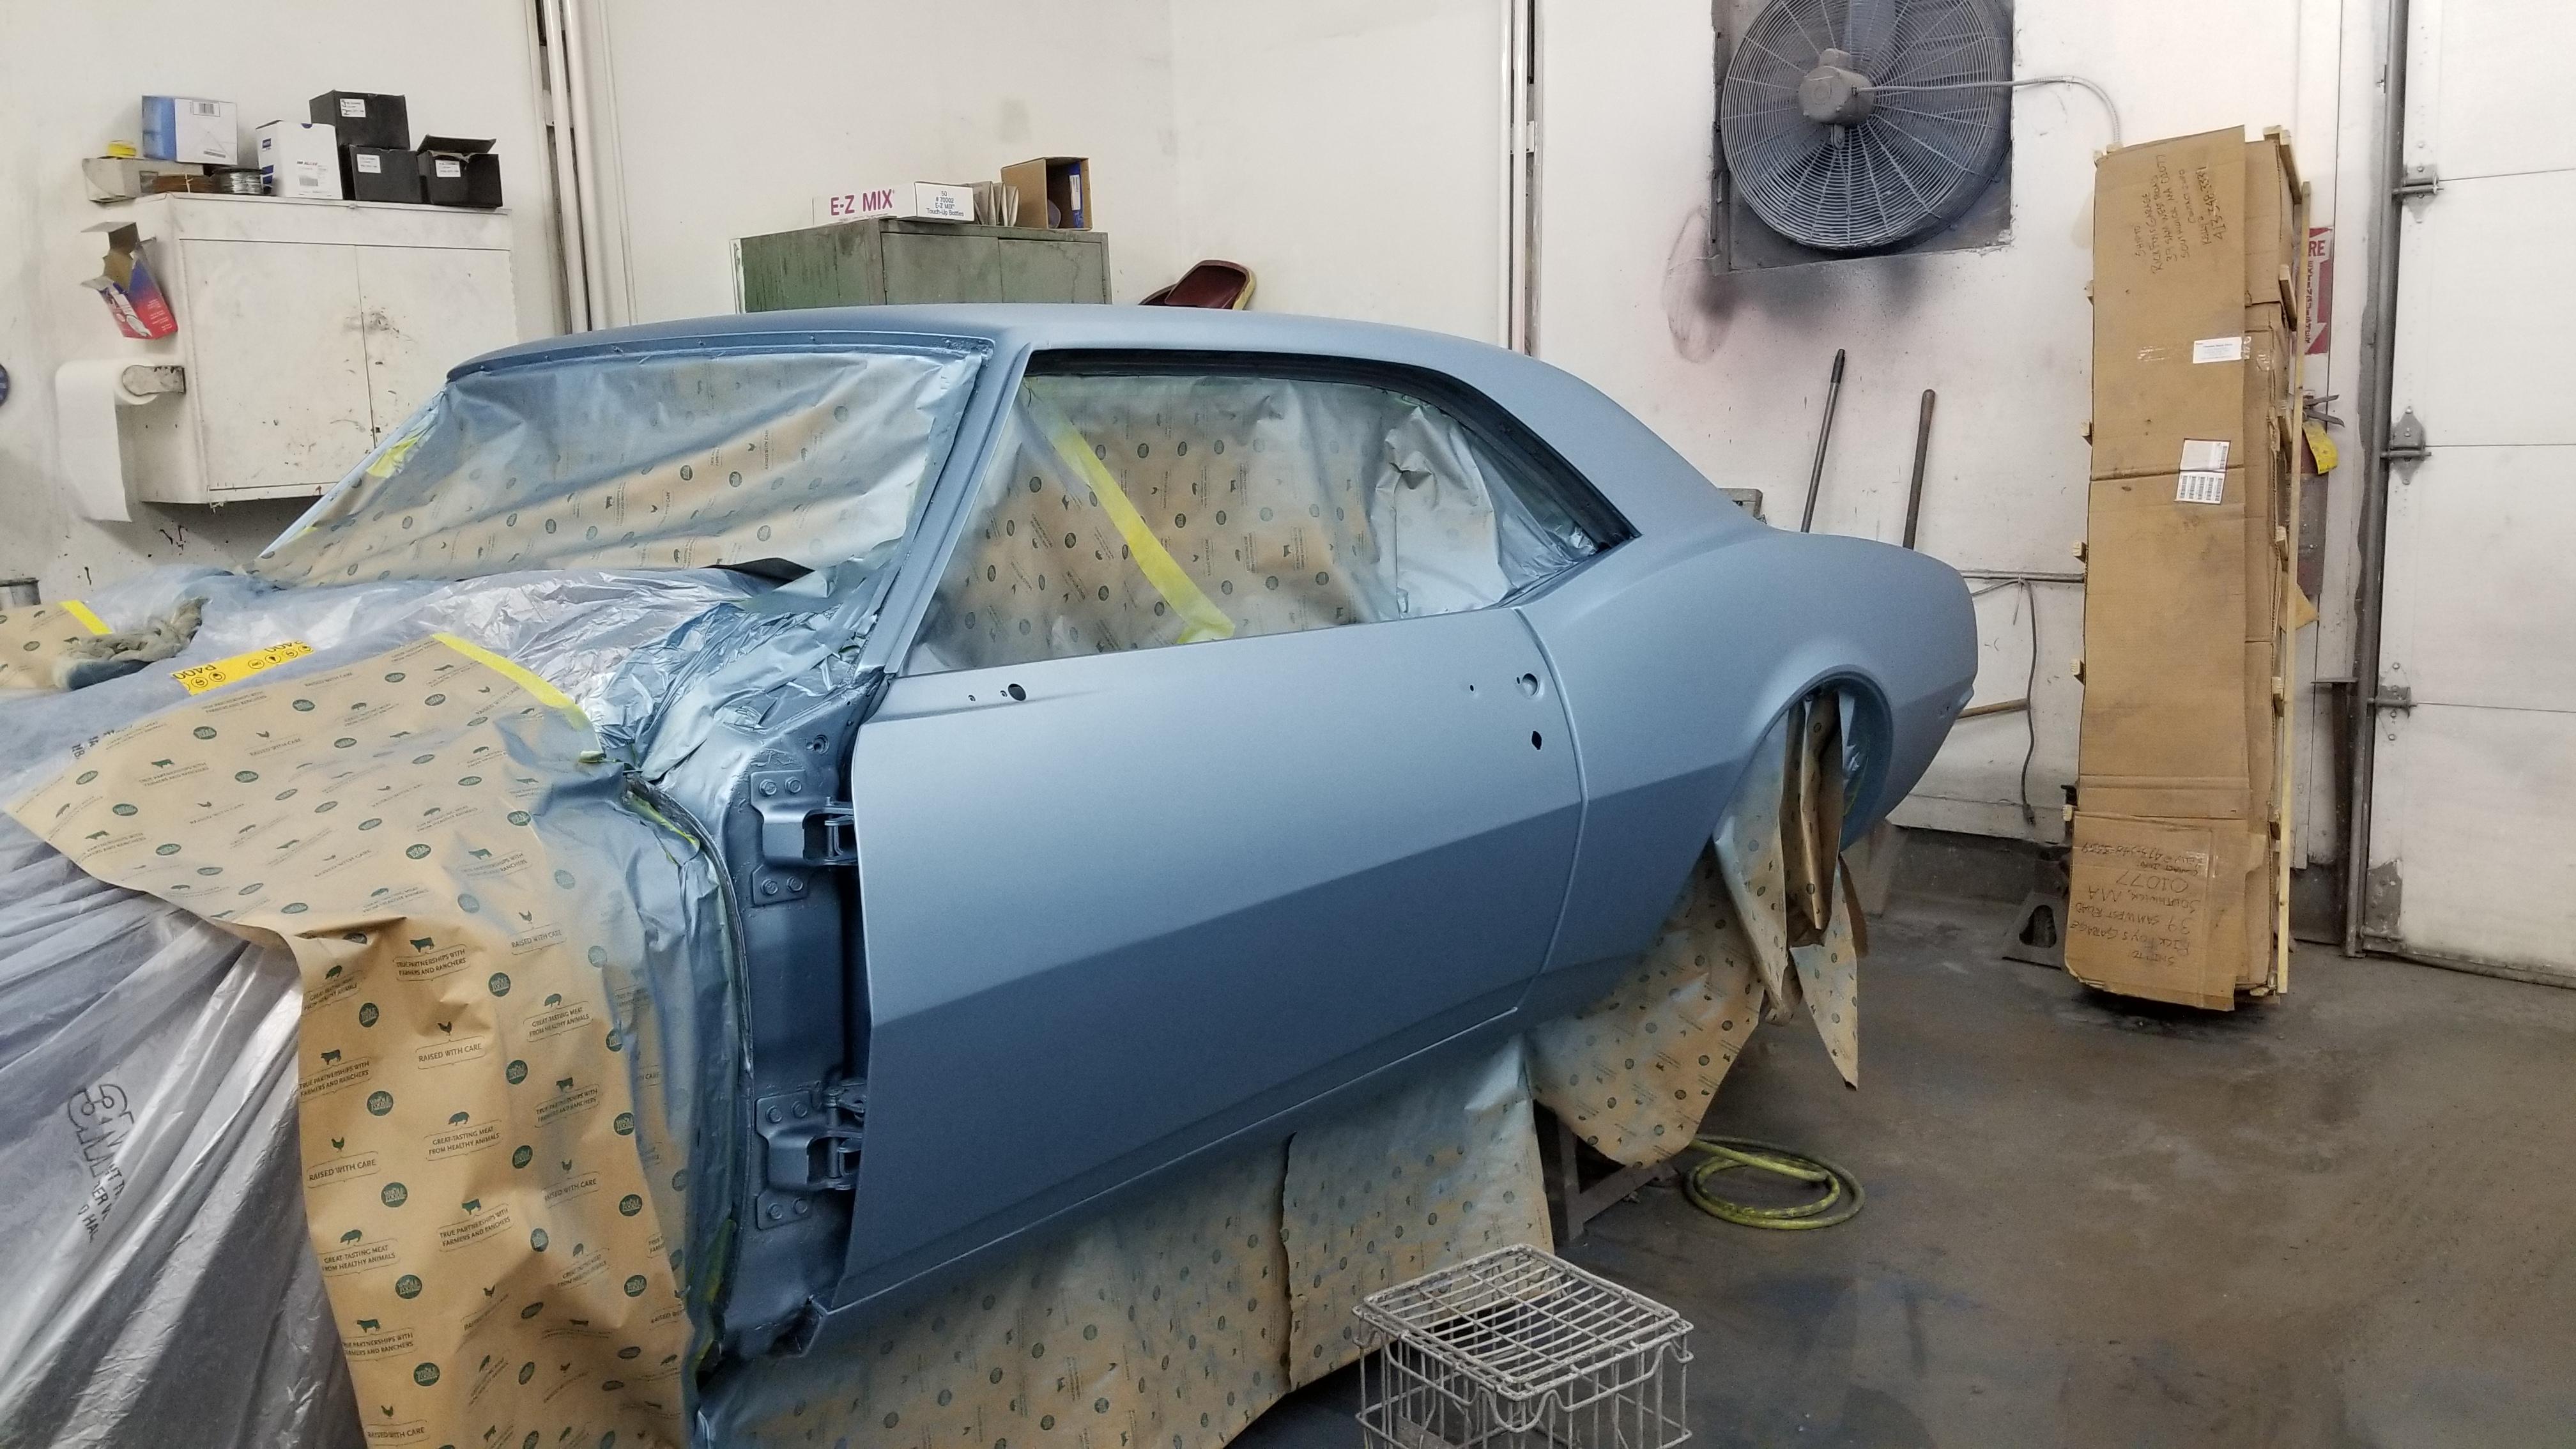 Rick Foy's Garage